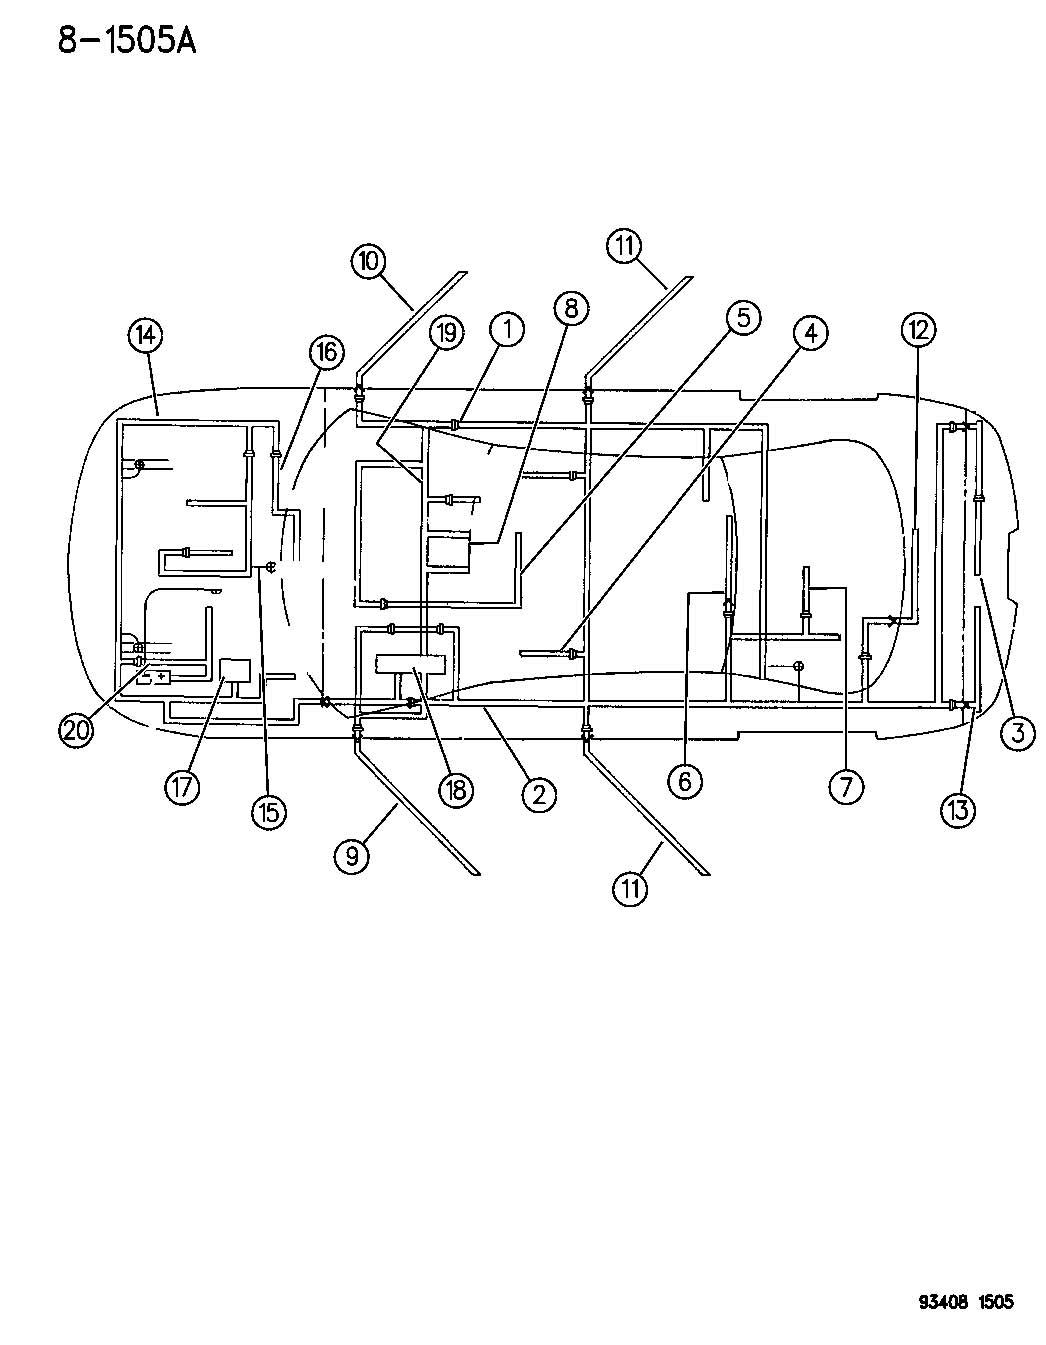 [DIAGRAM] 95 Eagle Vision Wiring Diagram FULL Version HD